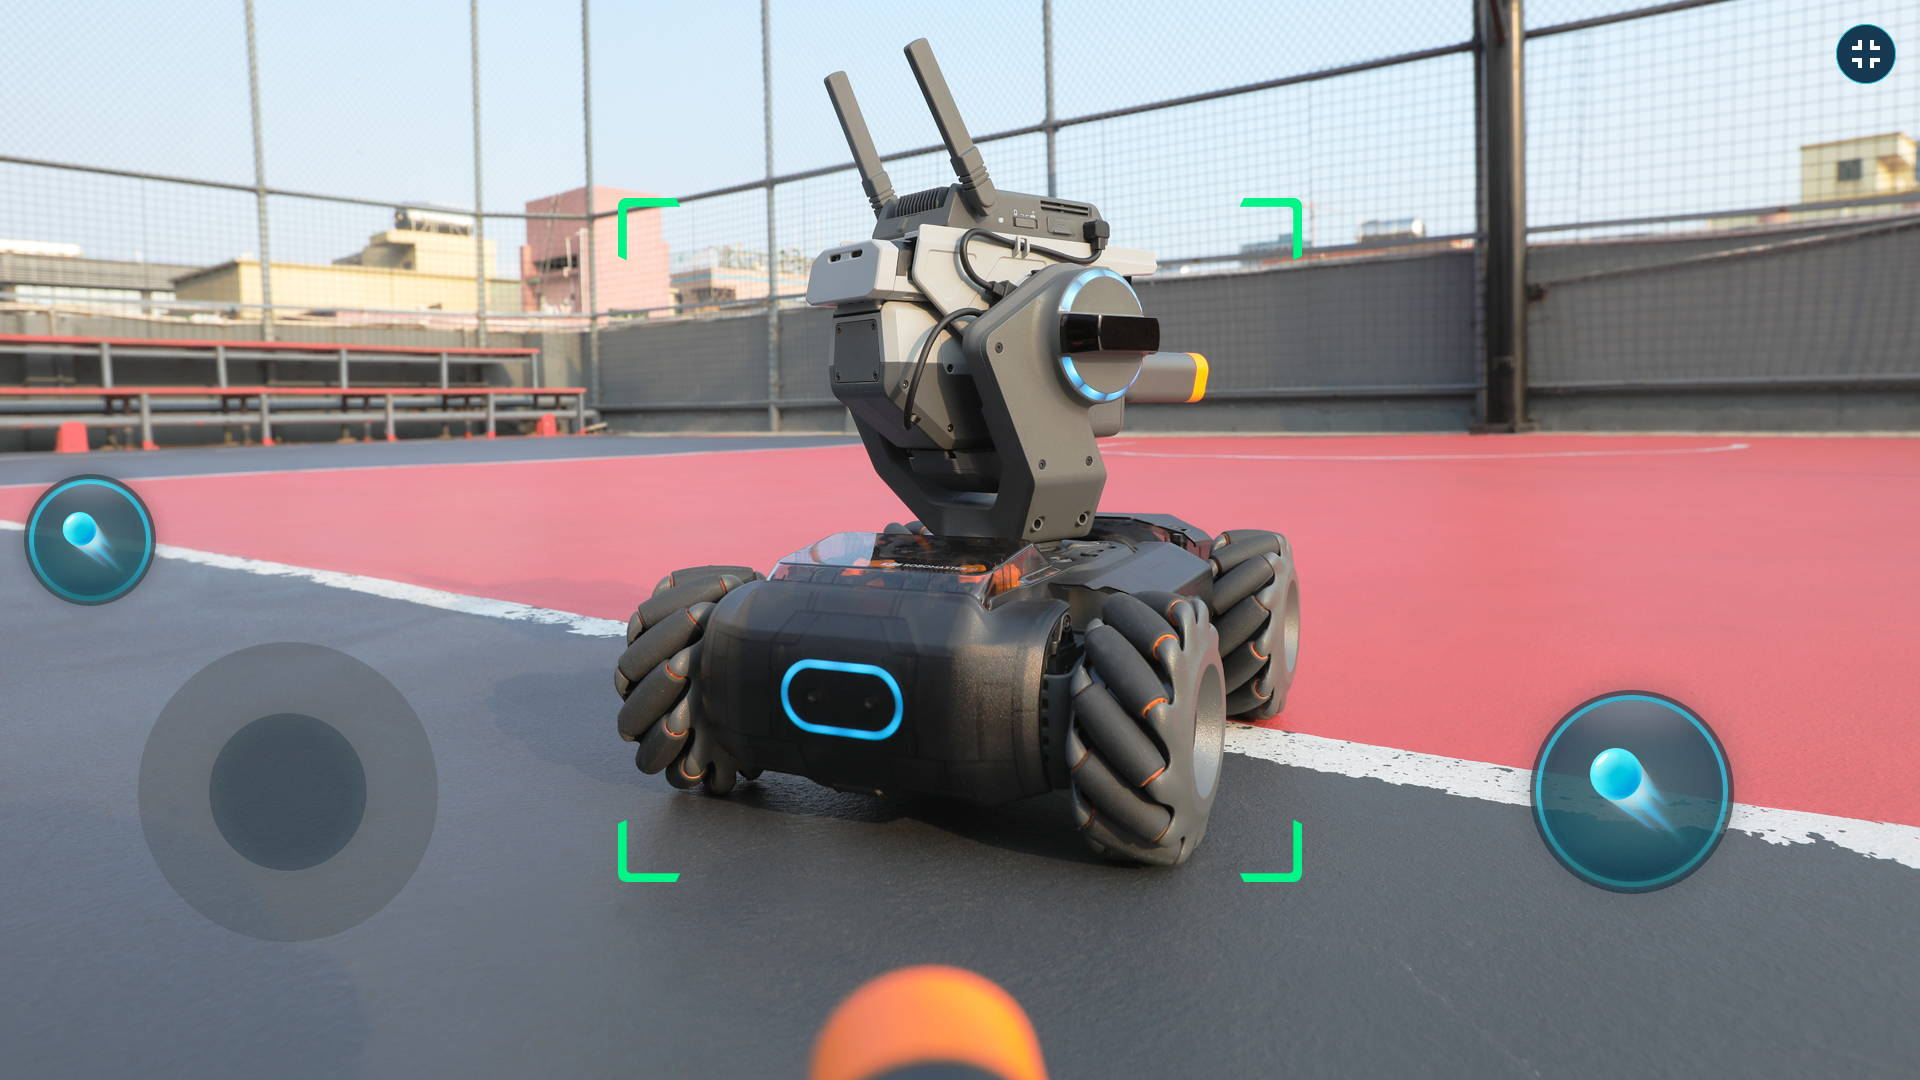 DJI RoboMaster S1  robot recognition